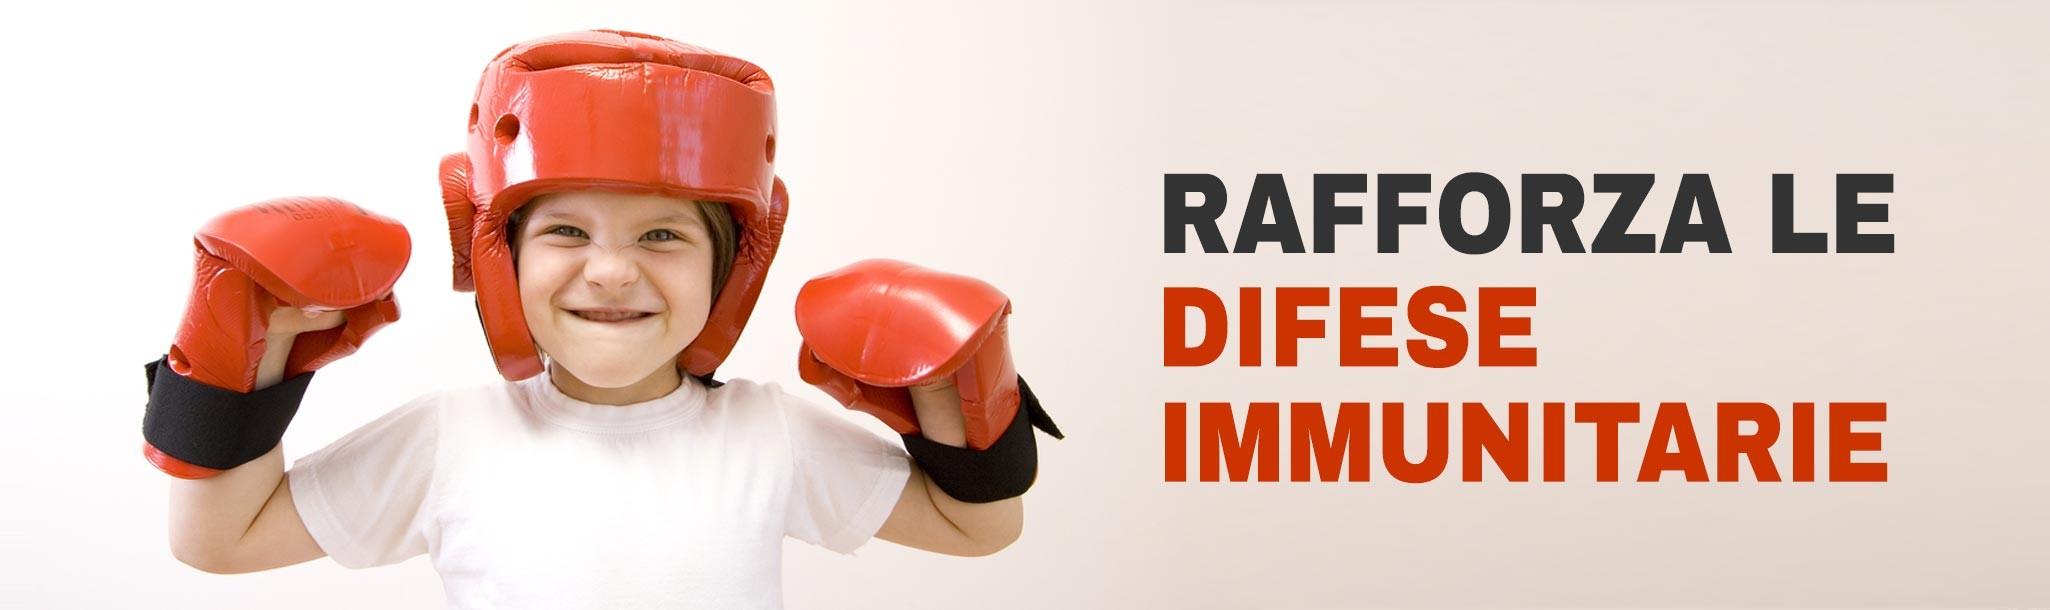 Integratori alimentari per rafforzare le difese immunitarie